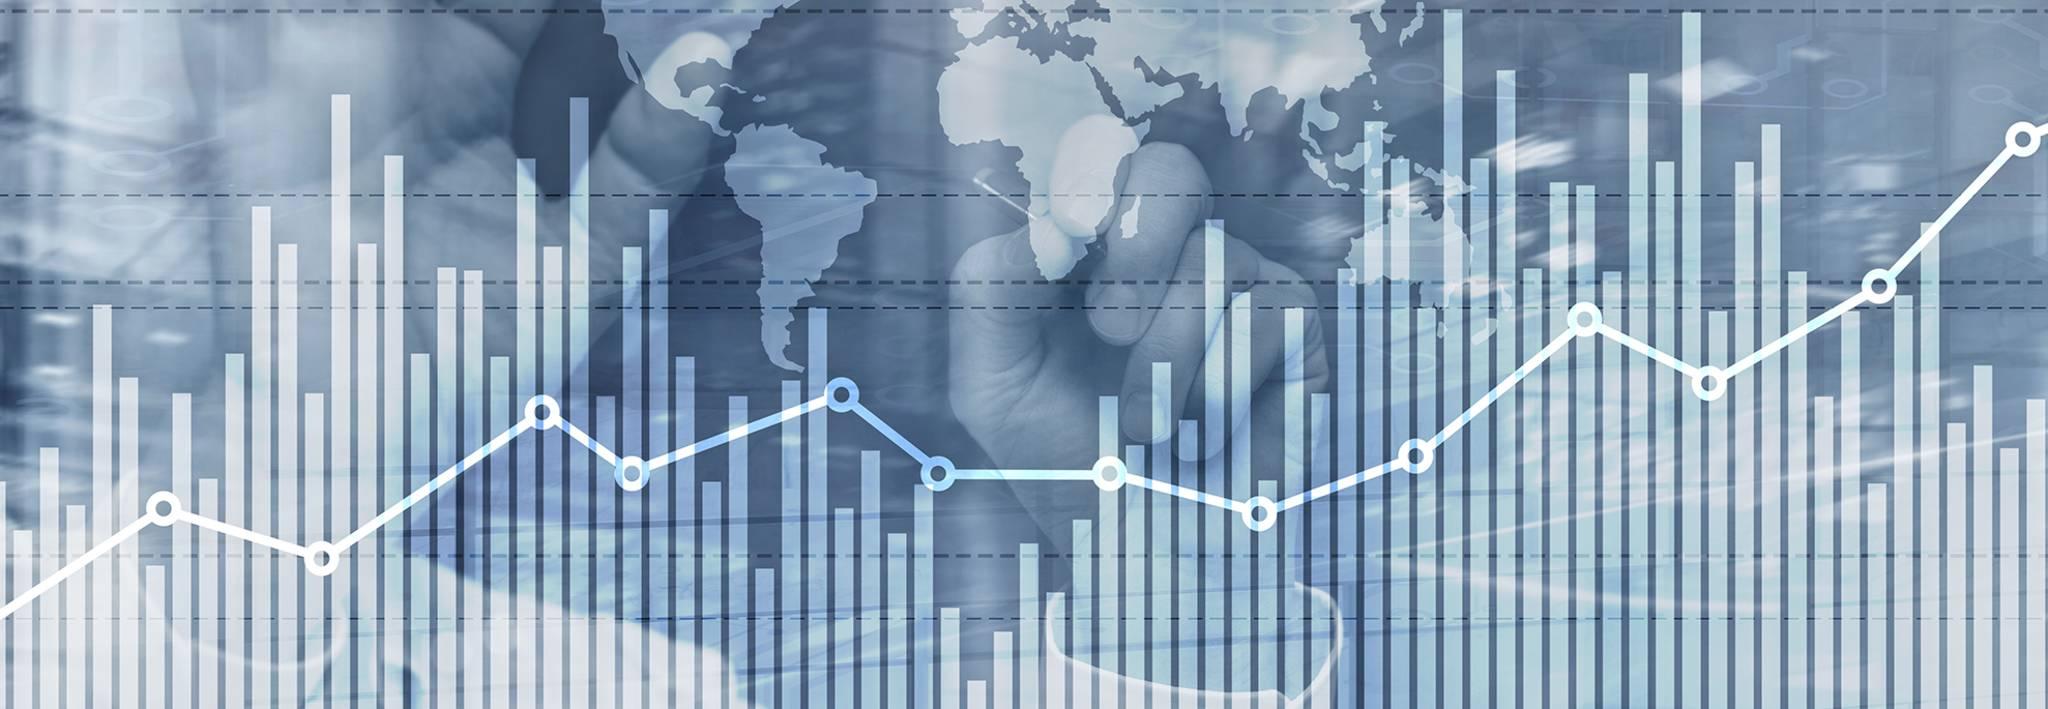 CCU offers an excellent online economics degree.